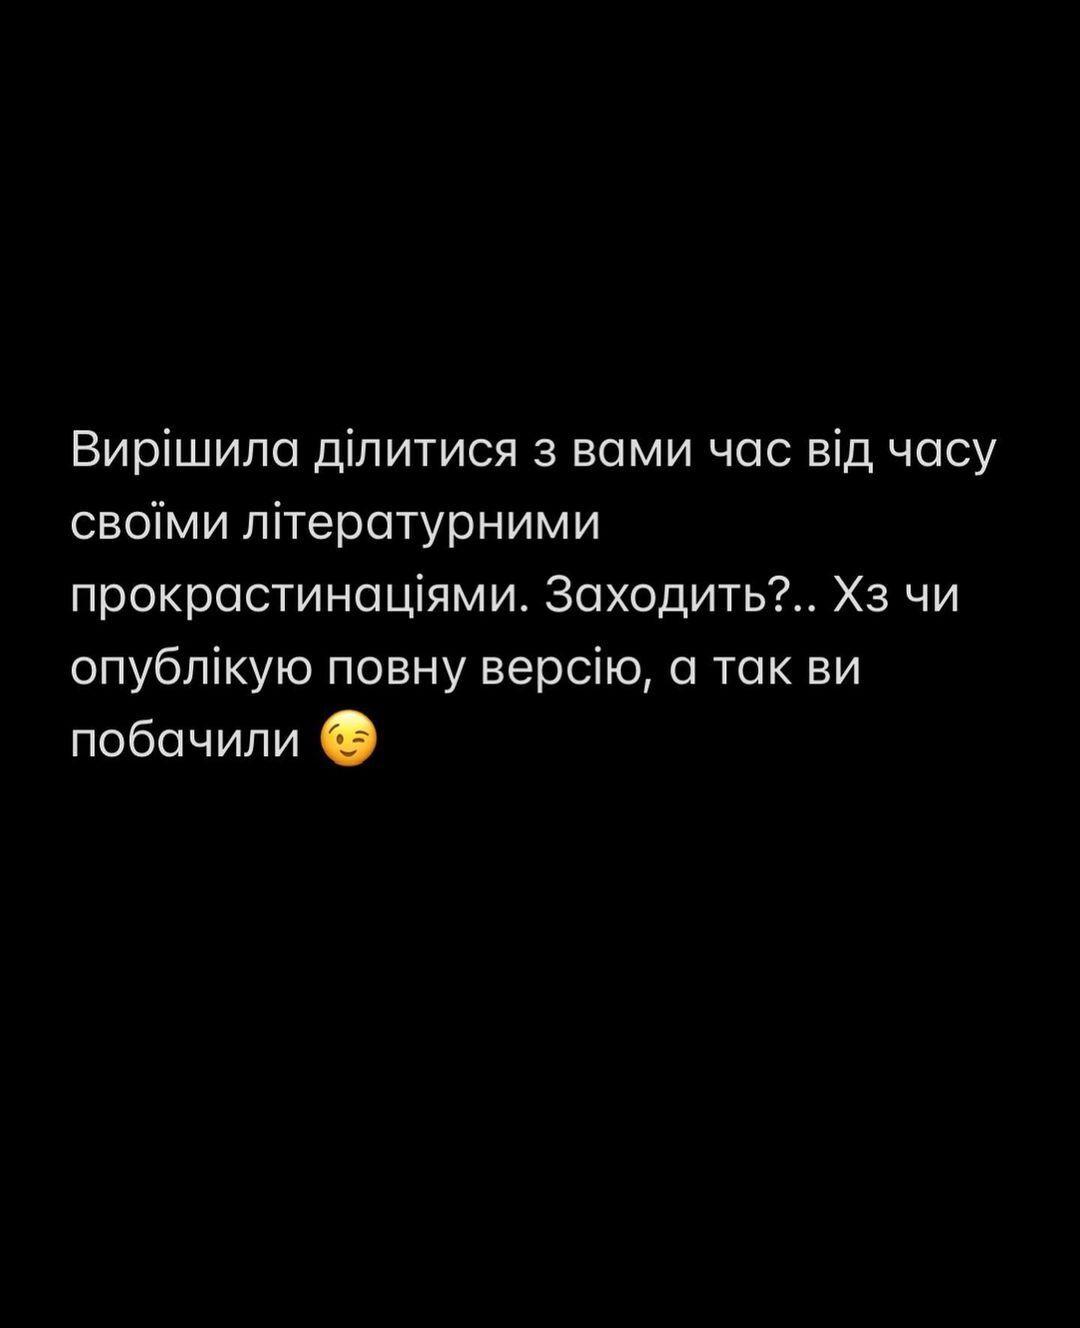 Instagram / qarpa